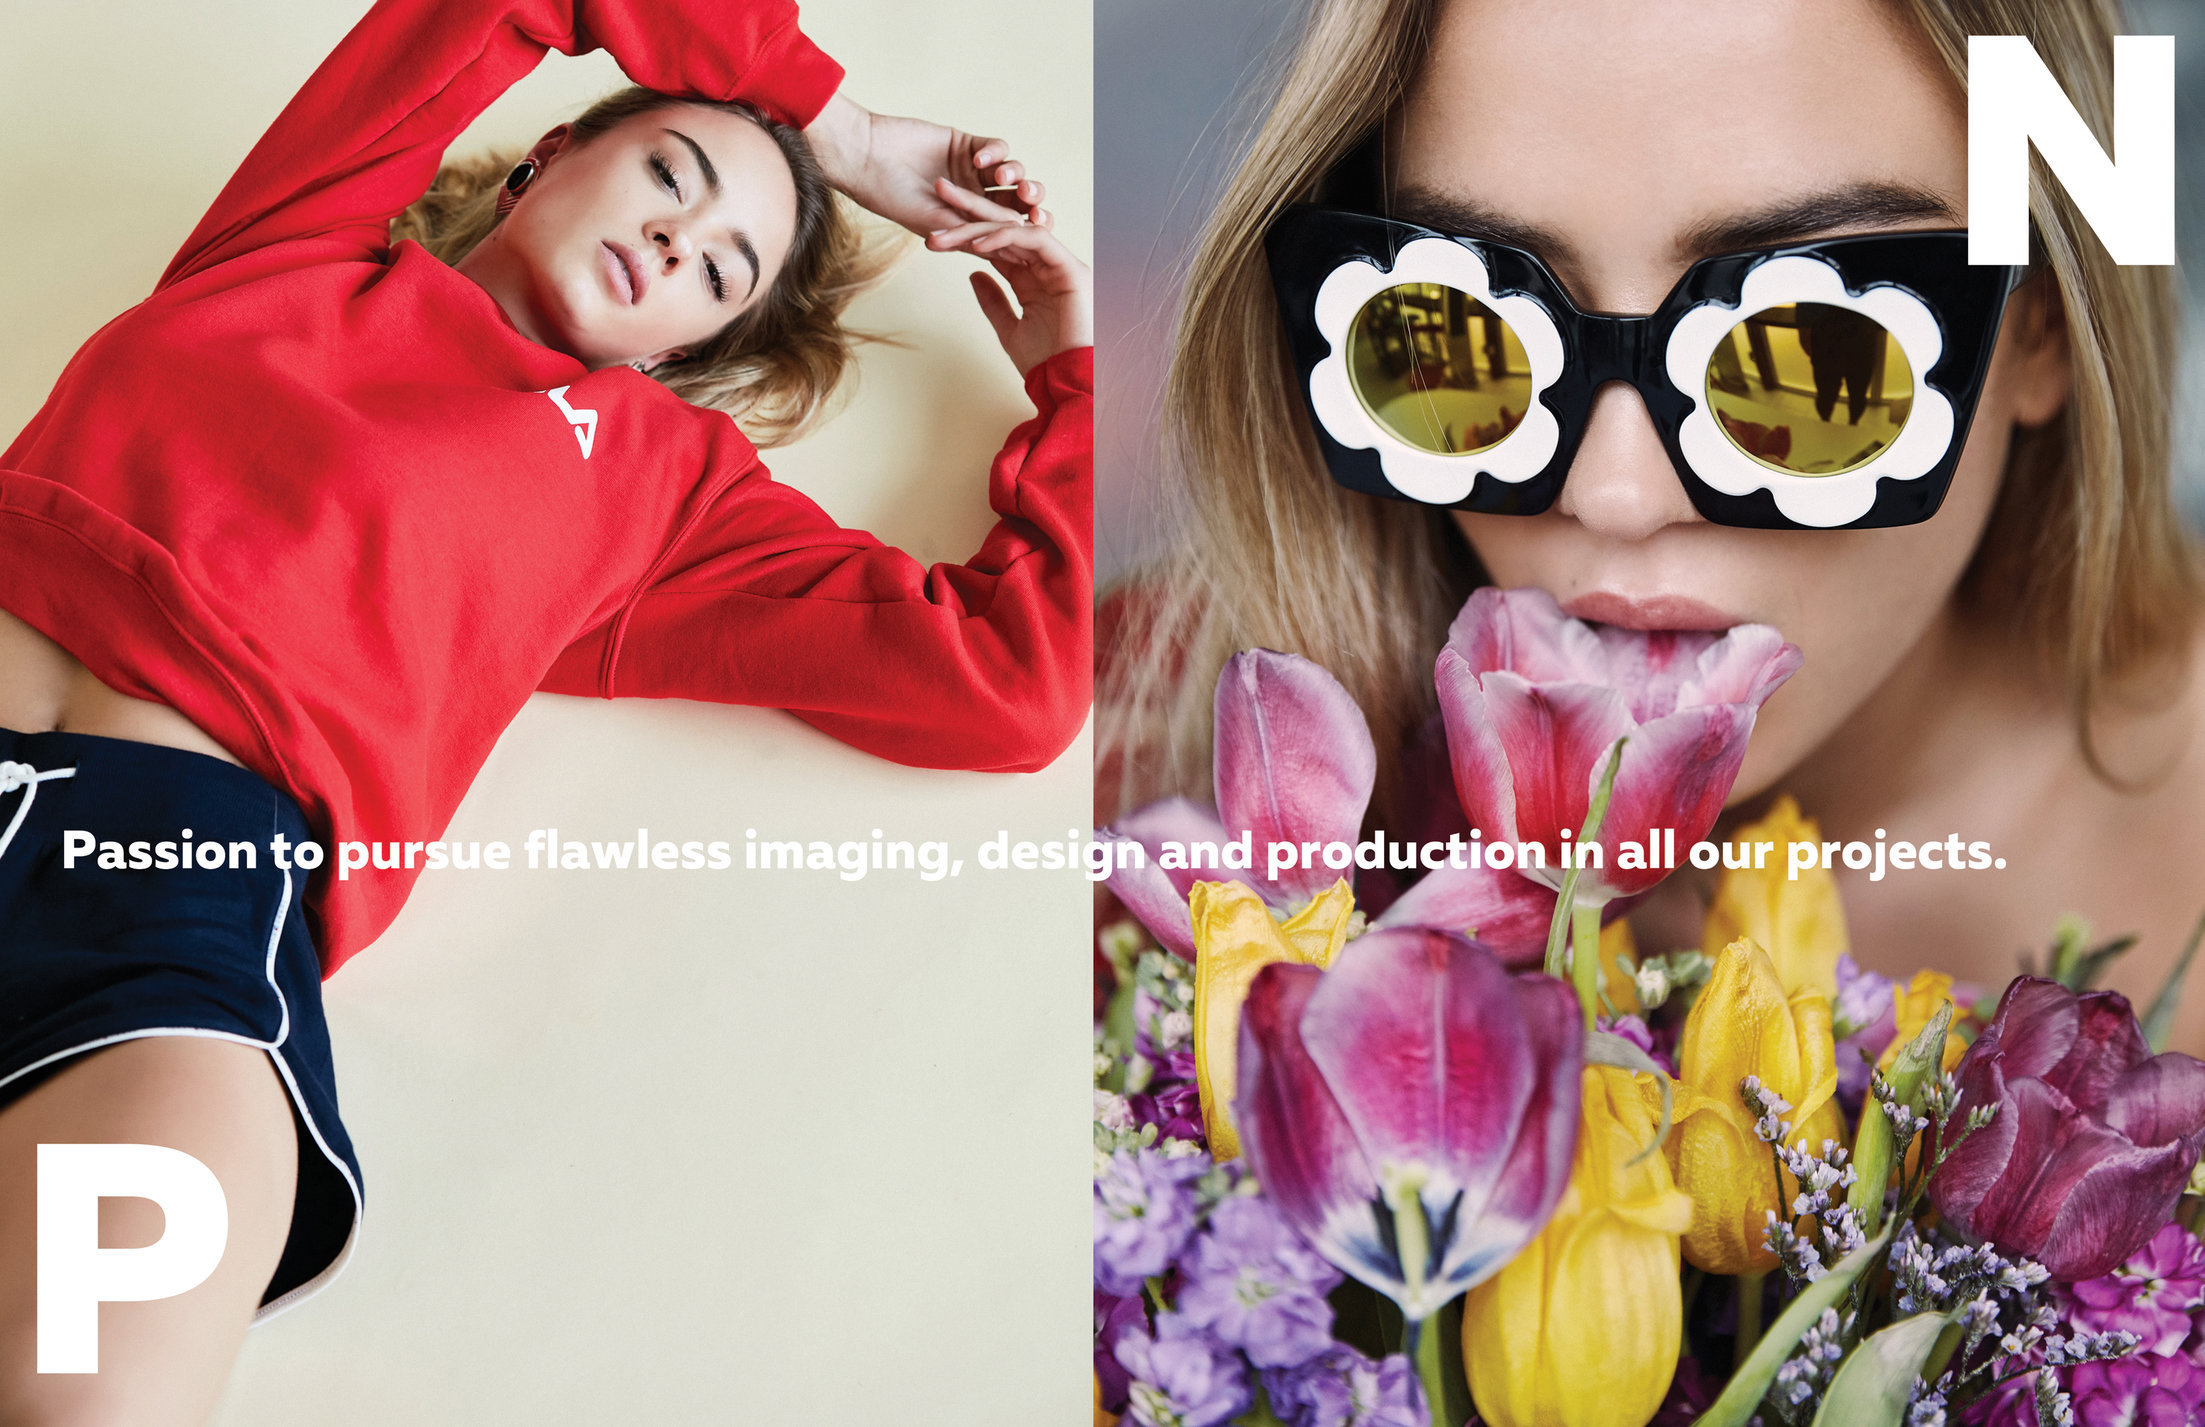 grate_das-model_nyc_sport_fashion-photographer-nico-stipcianos-miami.jpg